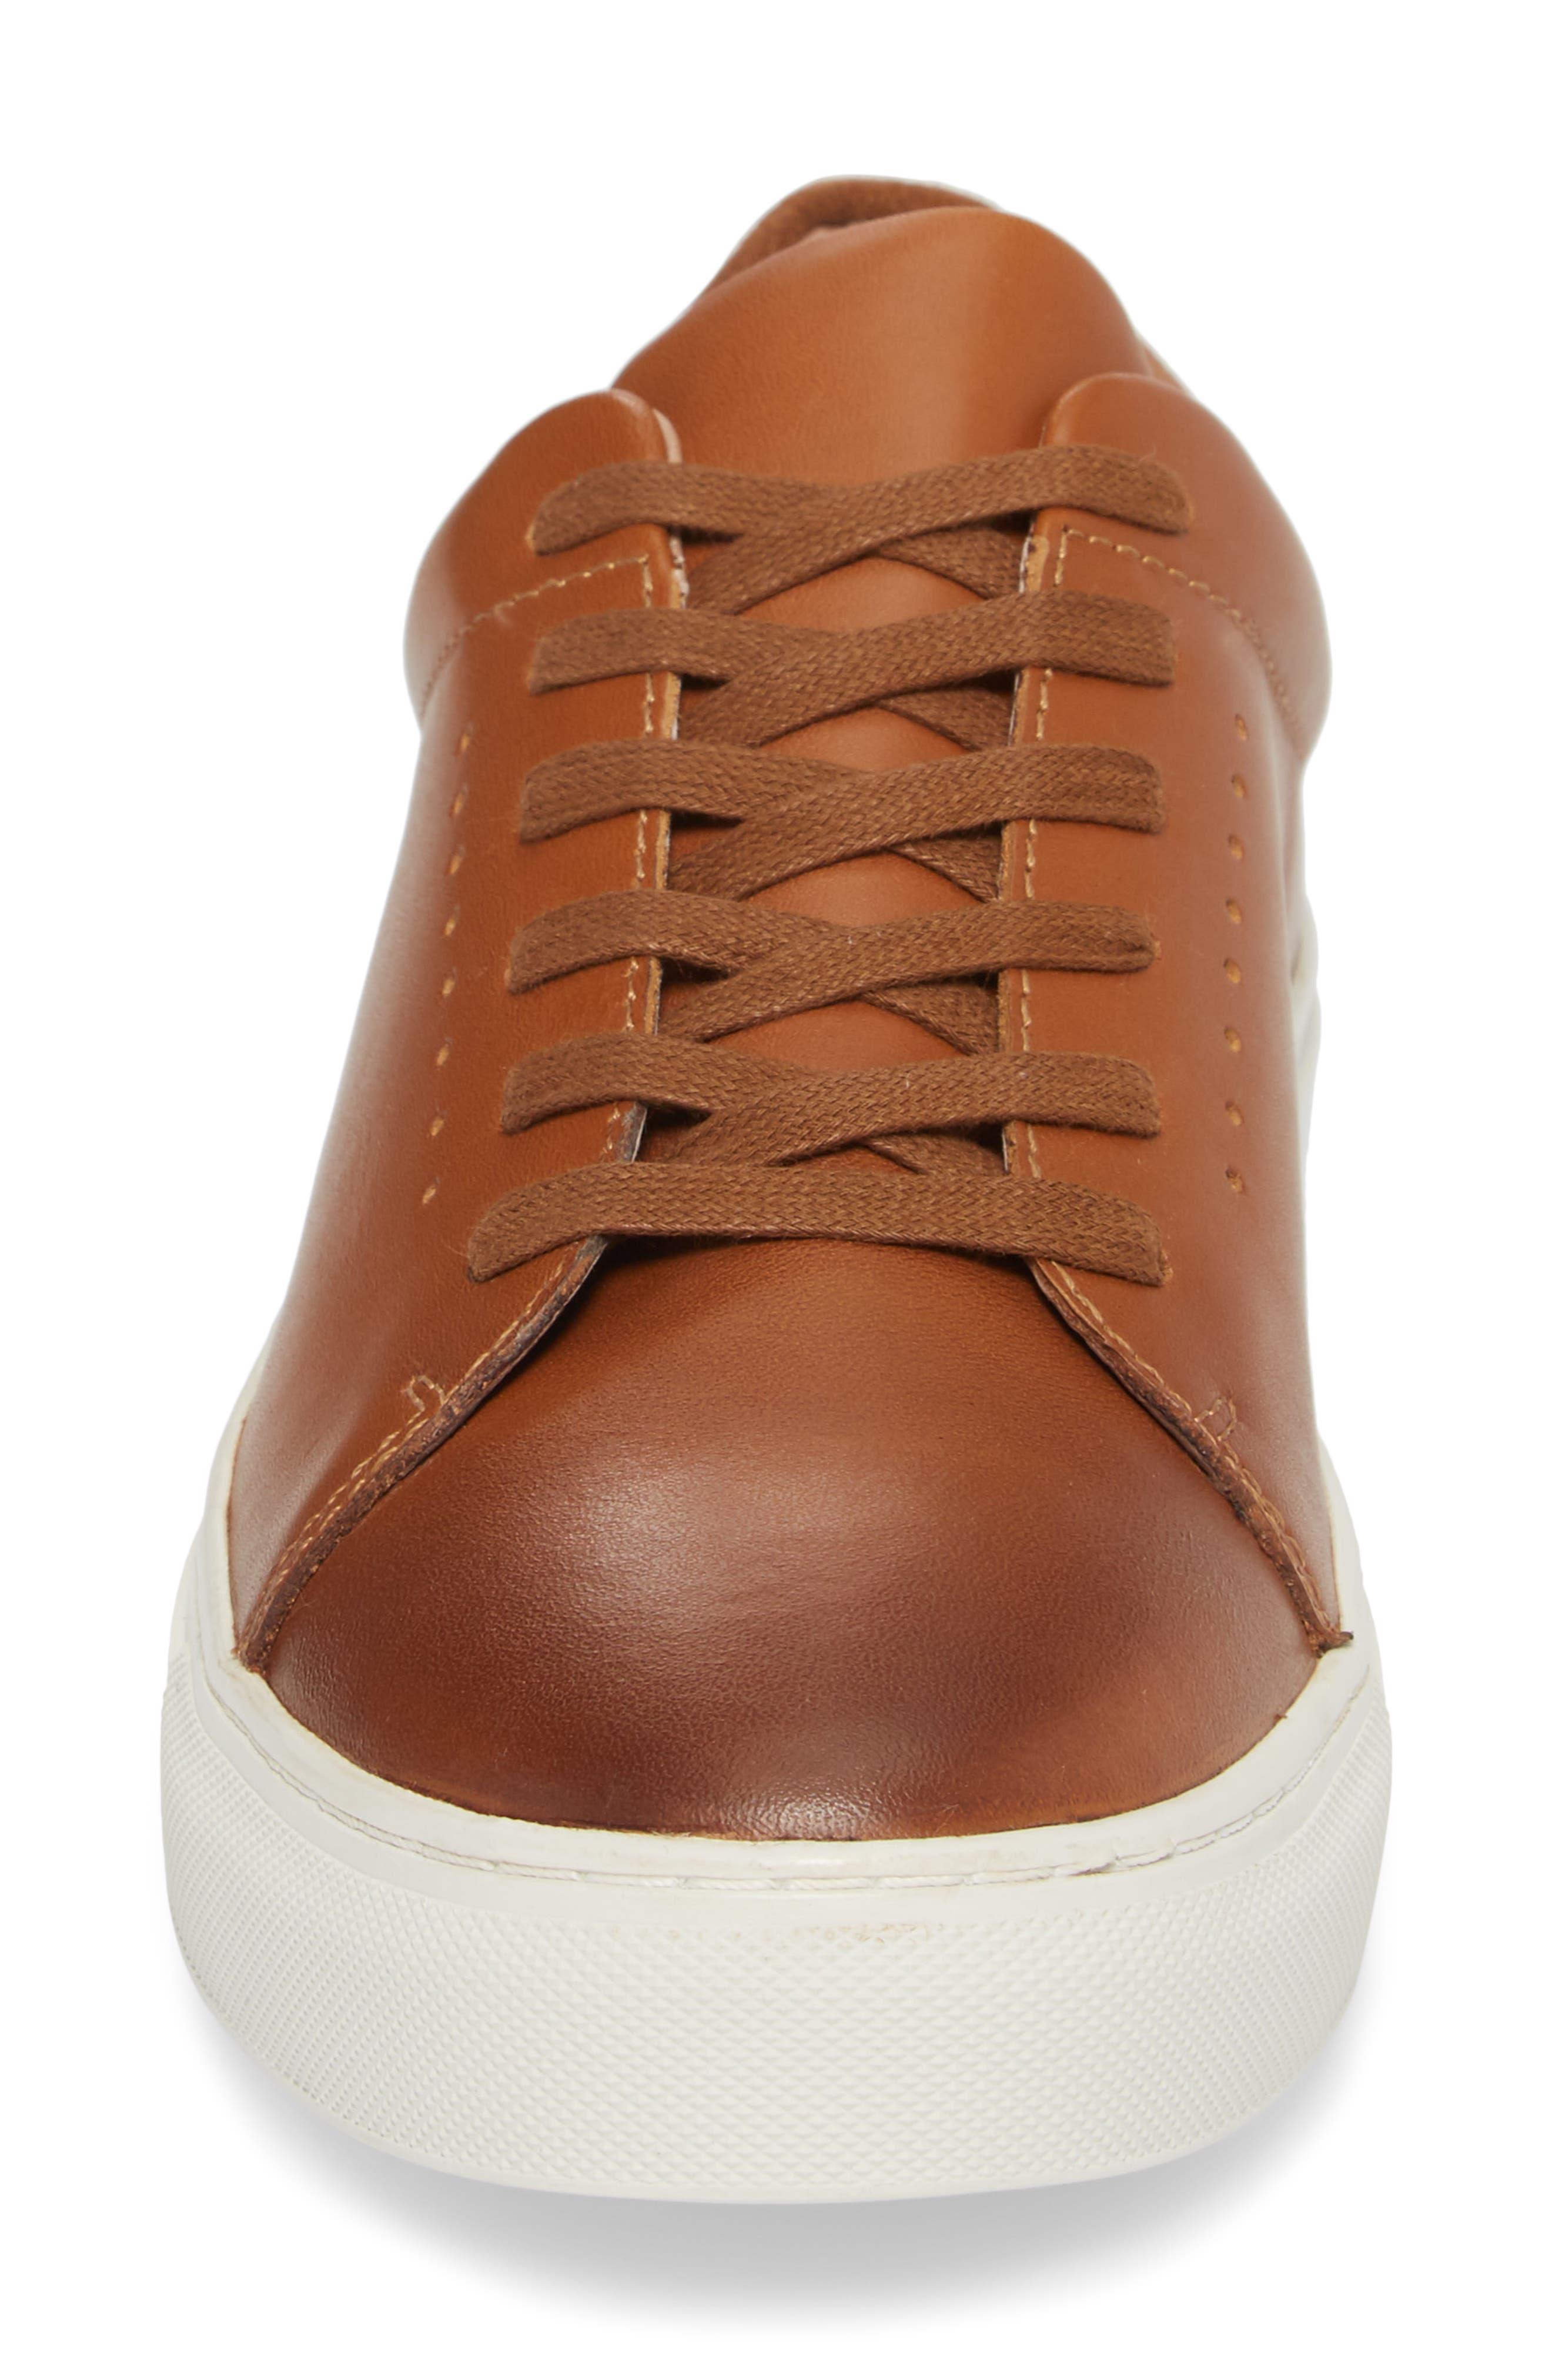 Desmond Sneaker,                             Alternate thumbnail 4, color,                             Tan Leather